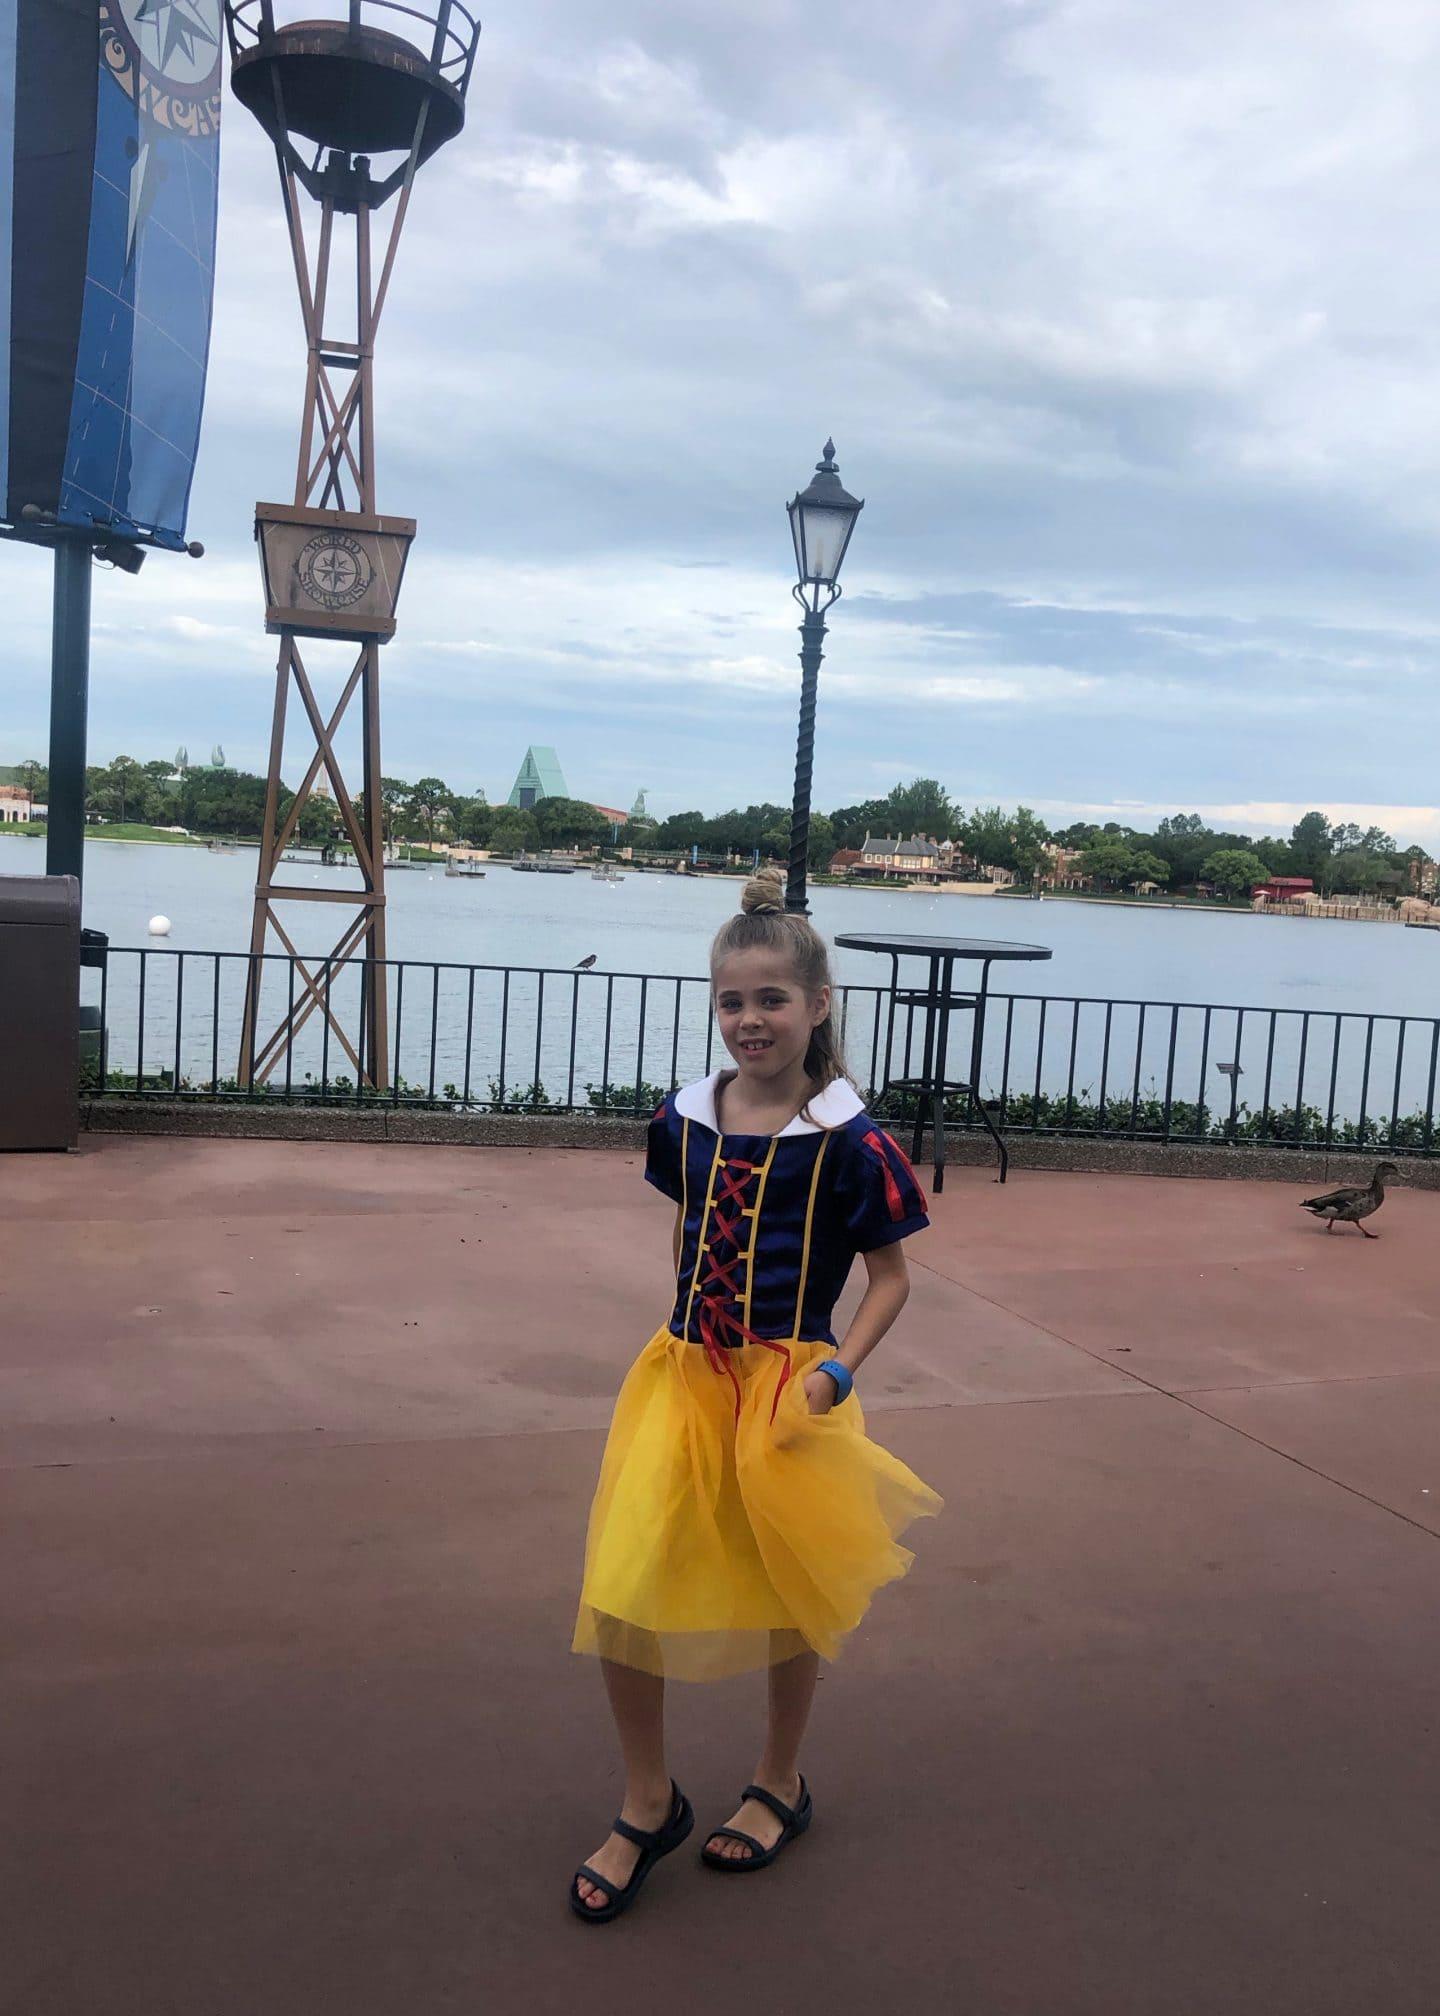 girls in princess dresses at Epcot